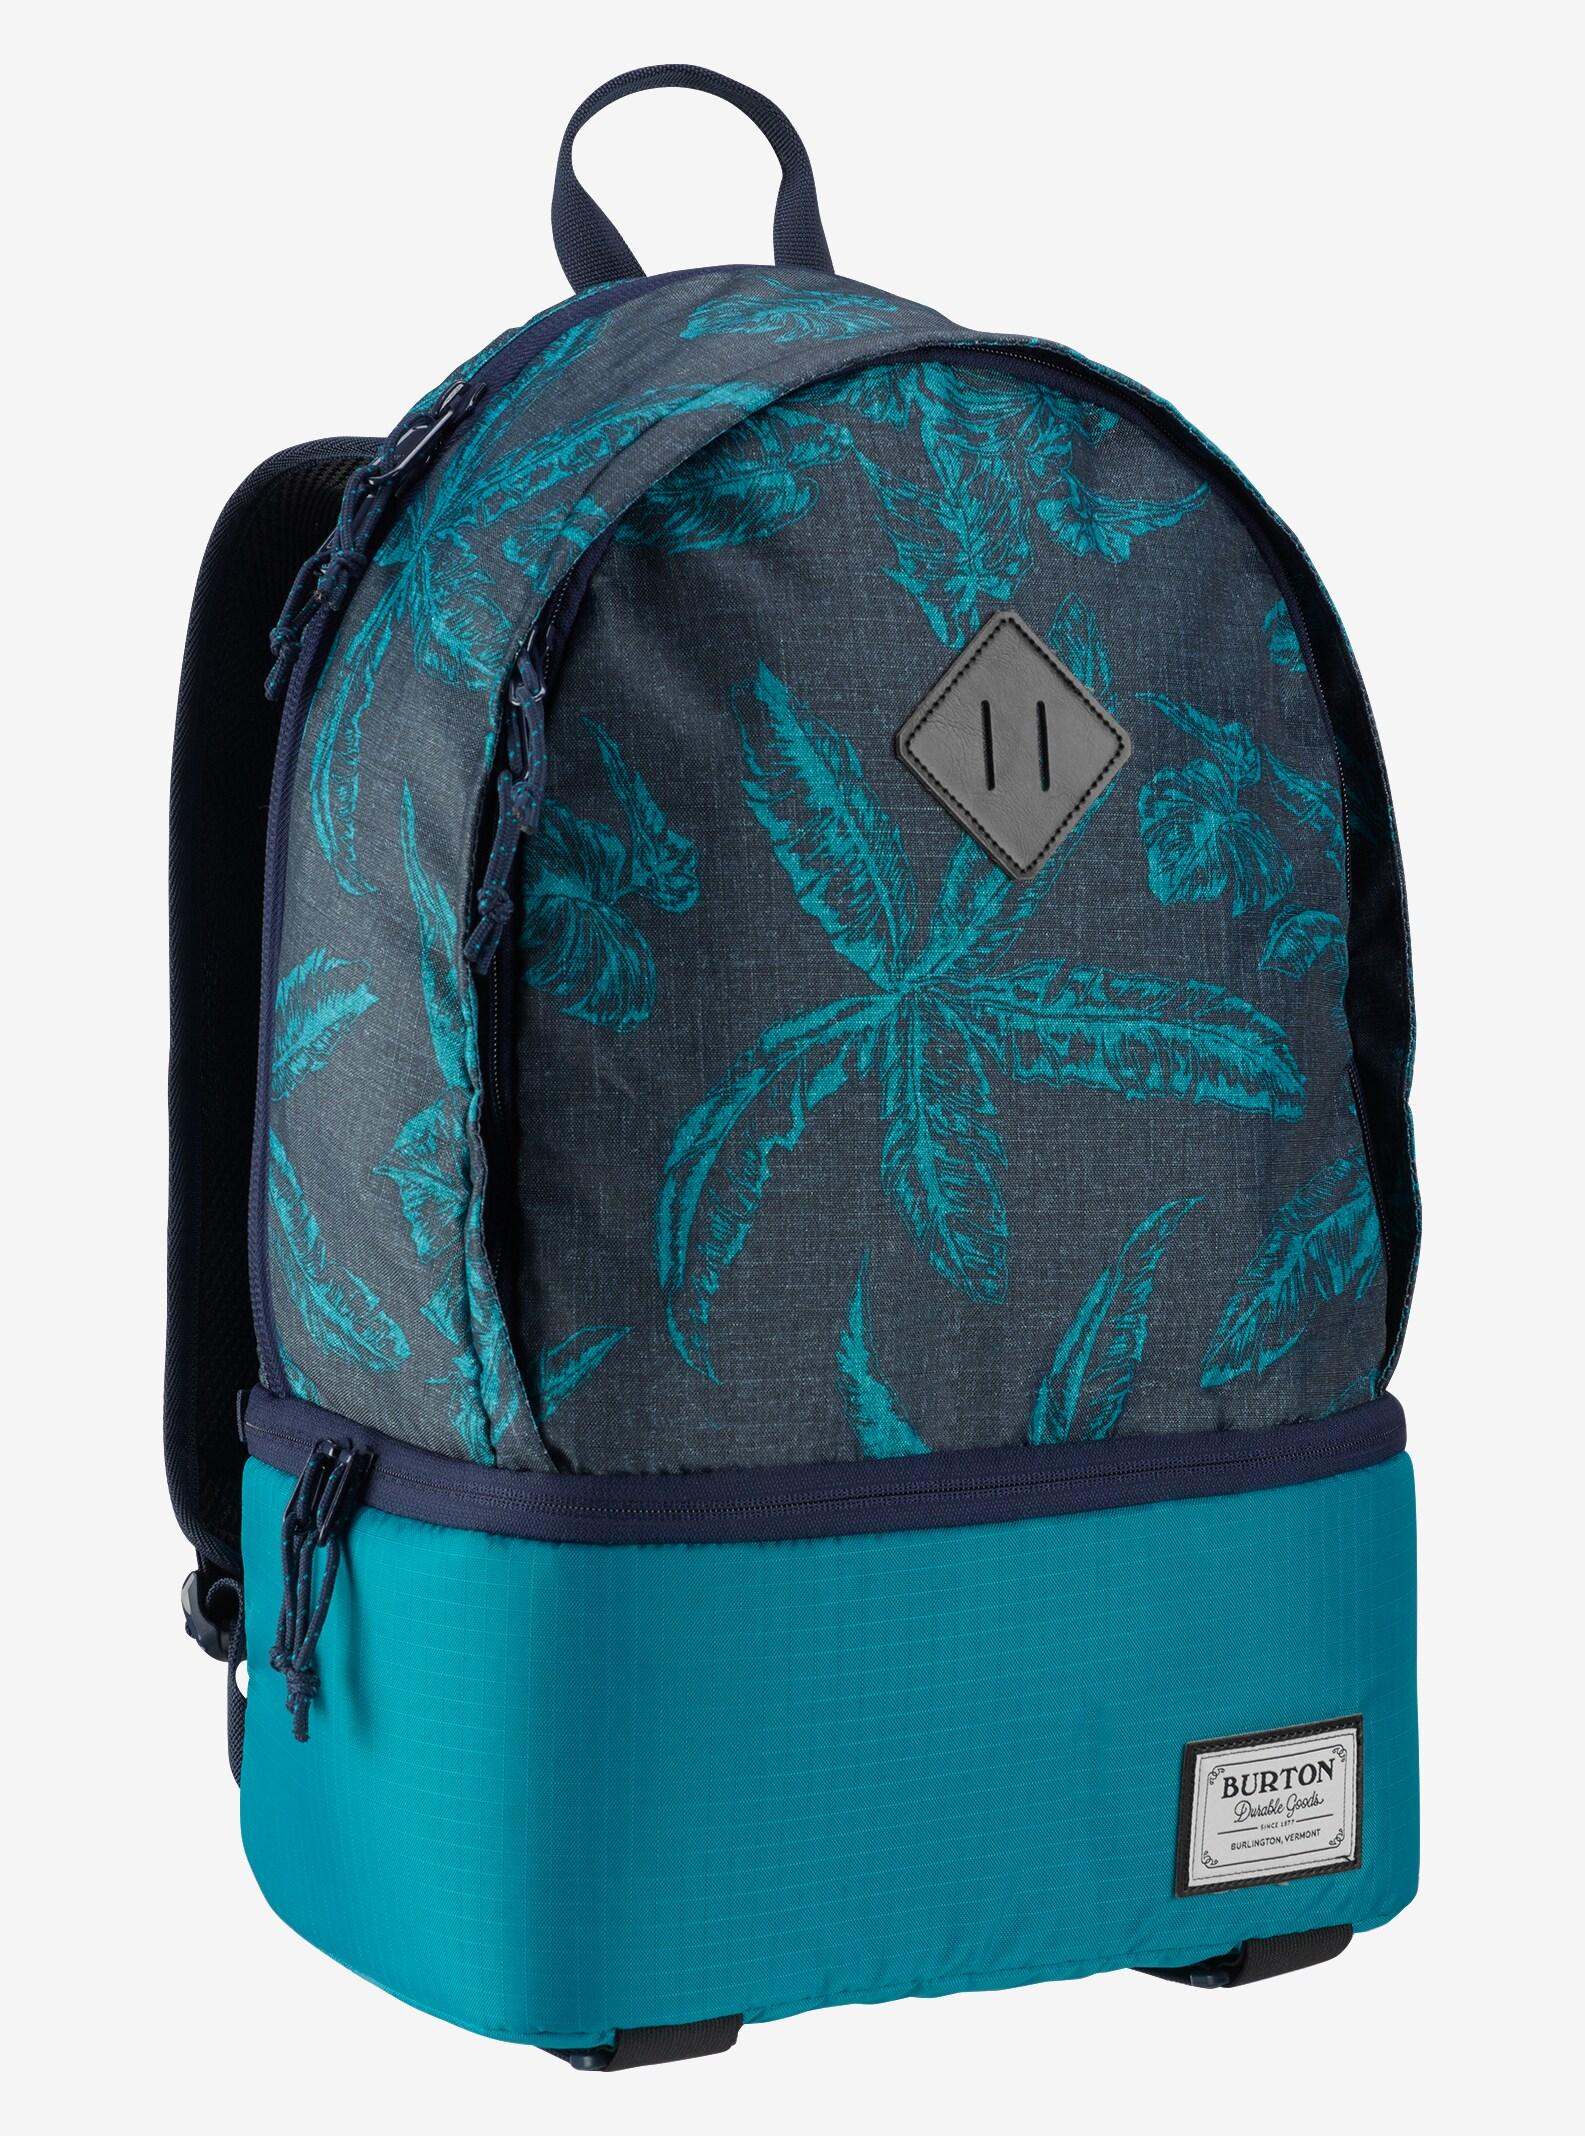 Burton Big Buddy Backpack shown in Tropical Print